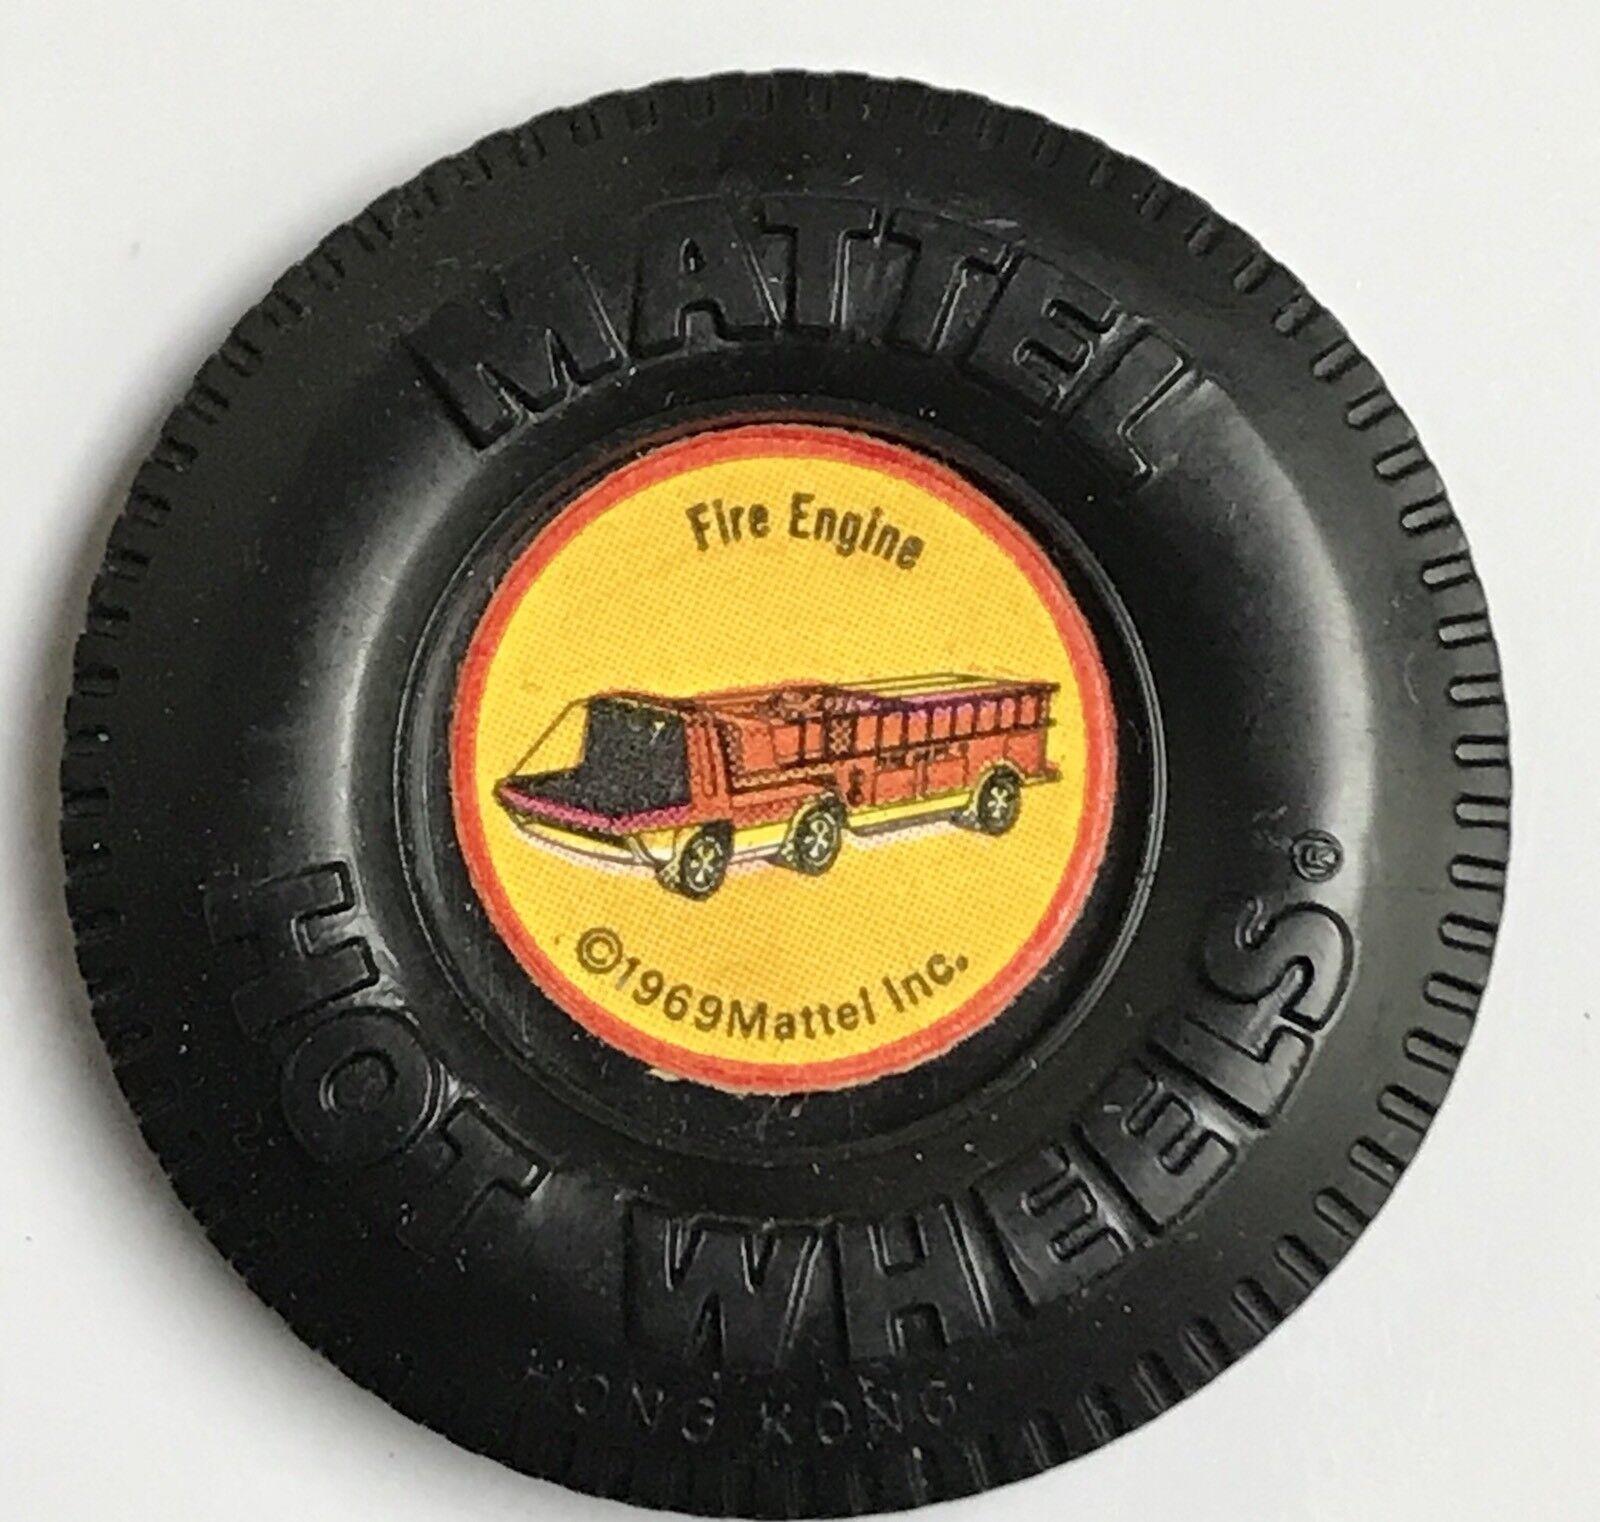 Heavyweights Fire Engine Plastic Button Hot Wheels rotline 1969 VHTF Badge